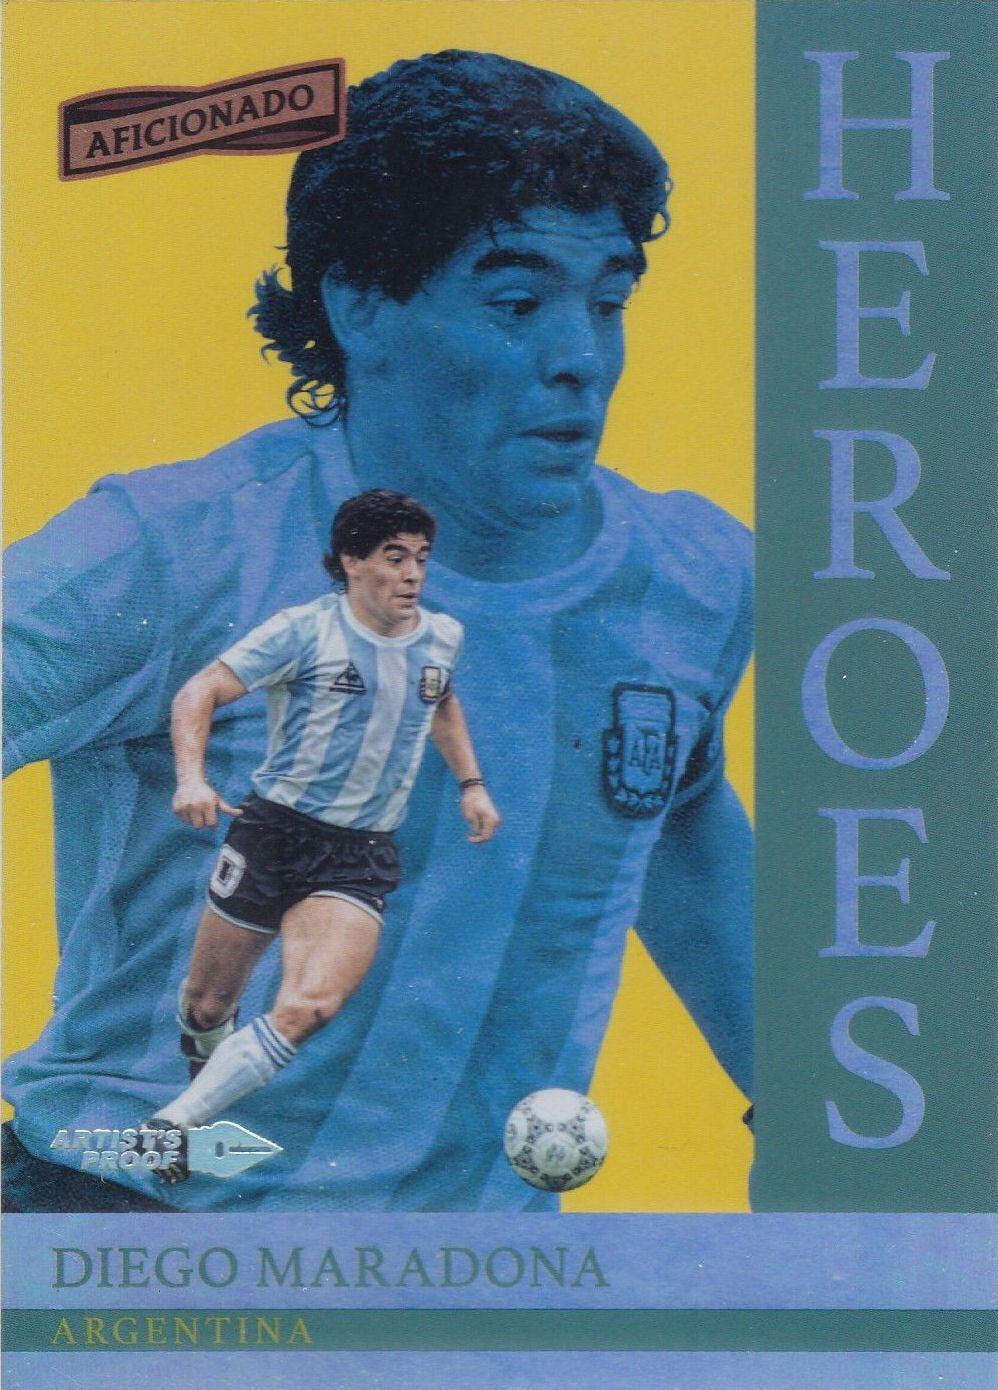 Diego Maradona Of Argentina Wallpaper Diego Maradona Football Wallpaper Football